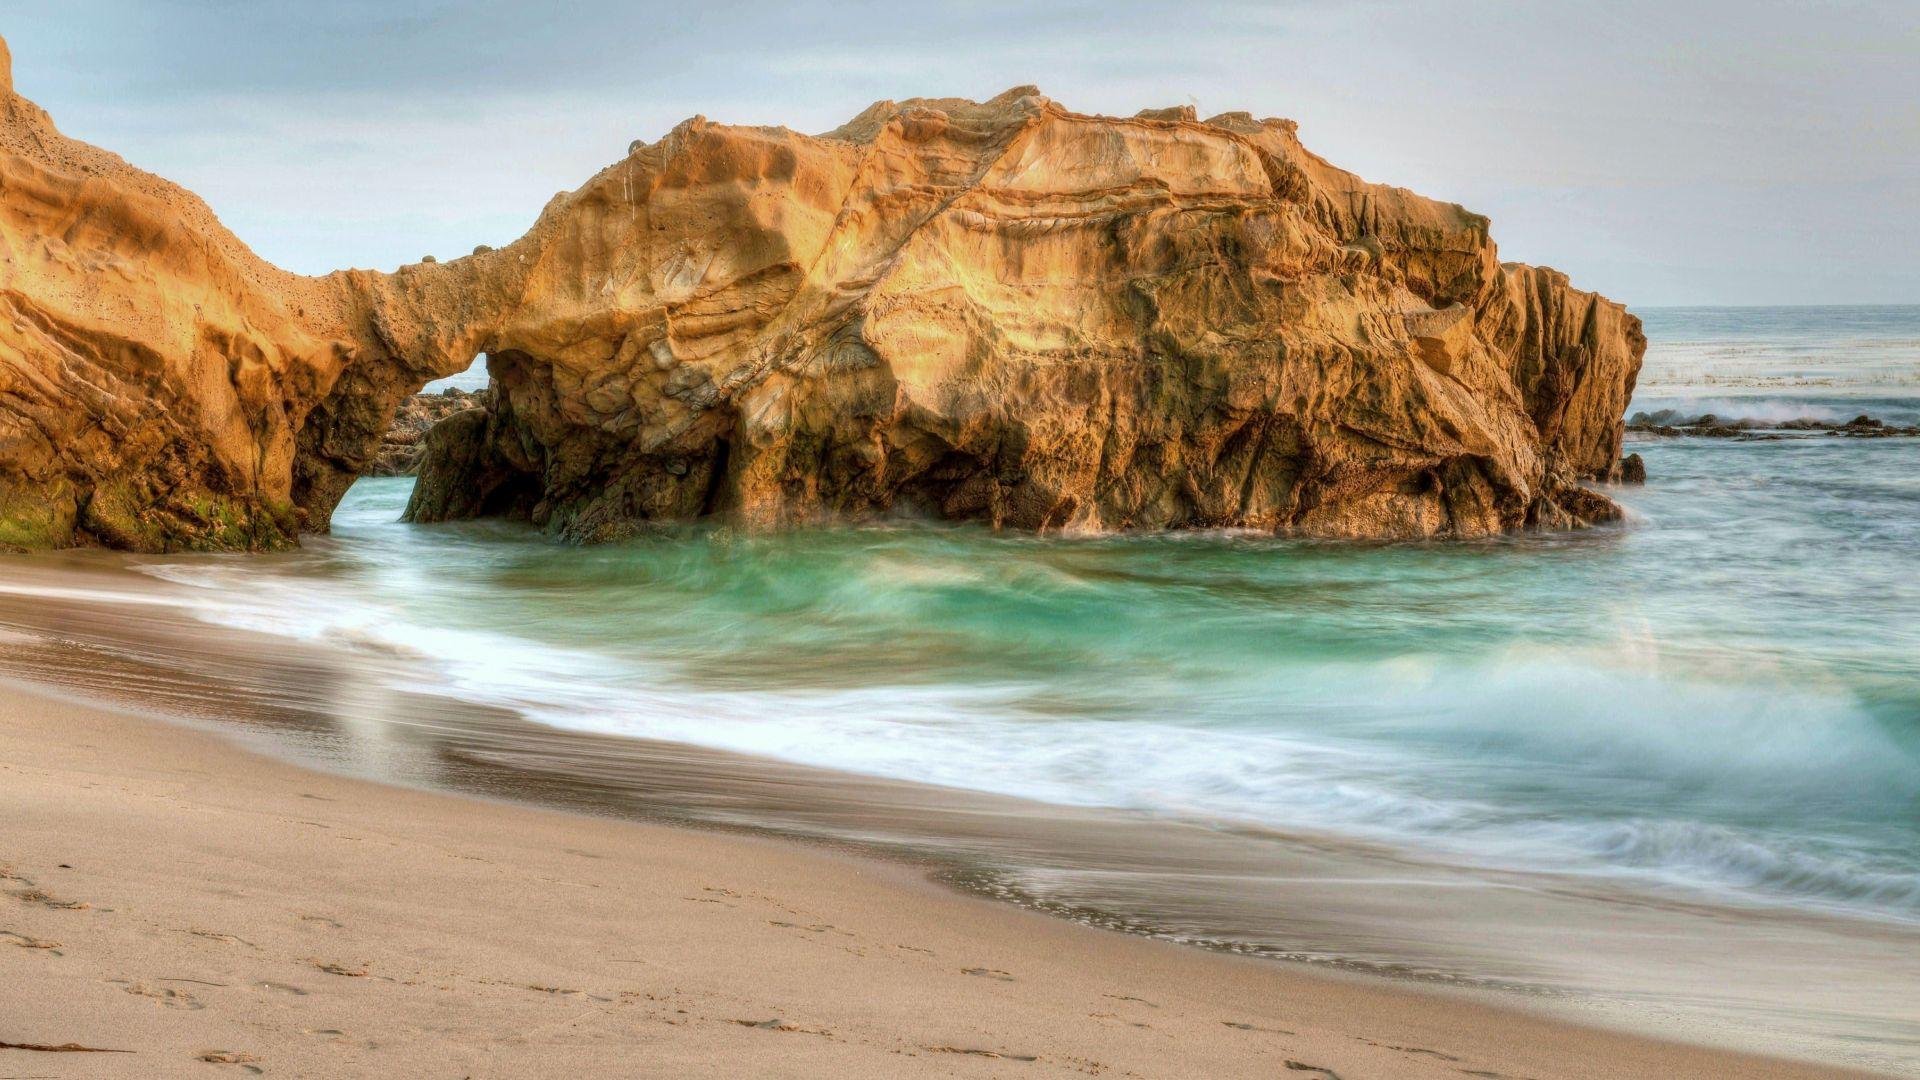 Pearl street beach california usa best beaches in the for Vacation beaches in california